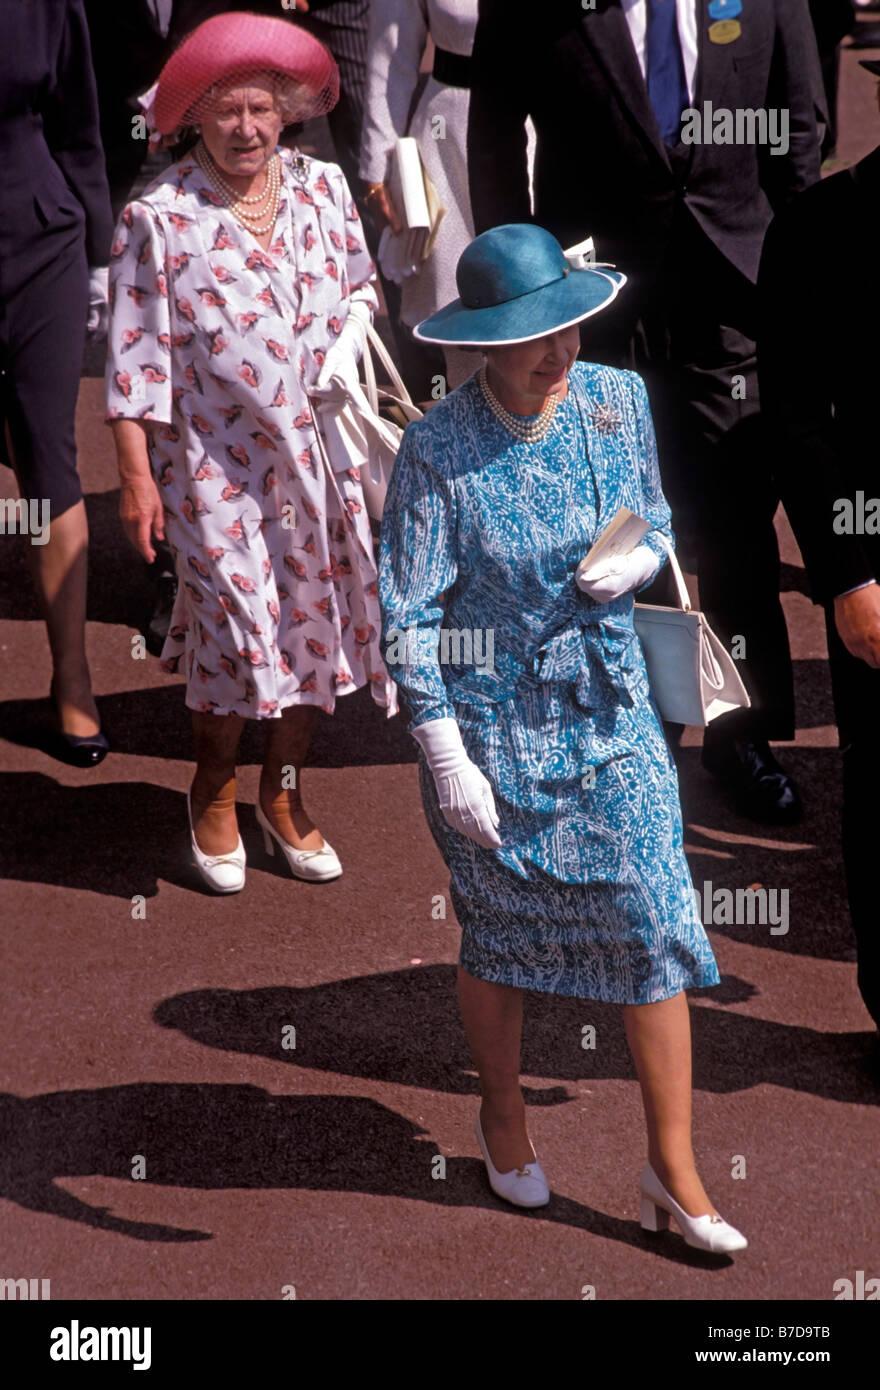 HRH Queen Elizabeth II and HM Queen Elizabeth the Queen Mother at the Royal Ascot races 1989 - Stock Image